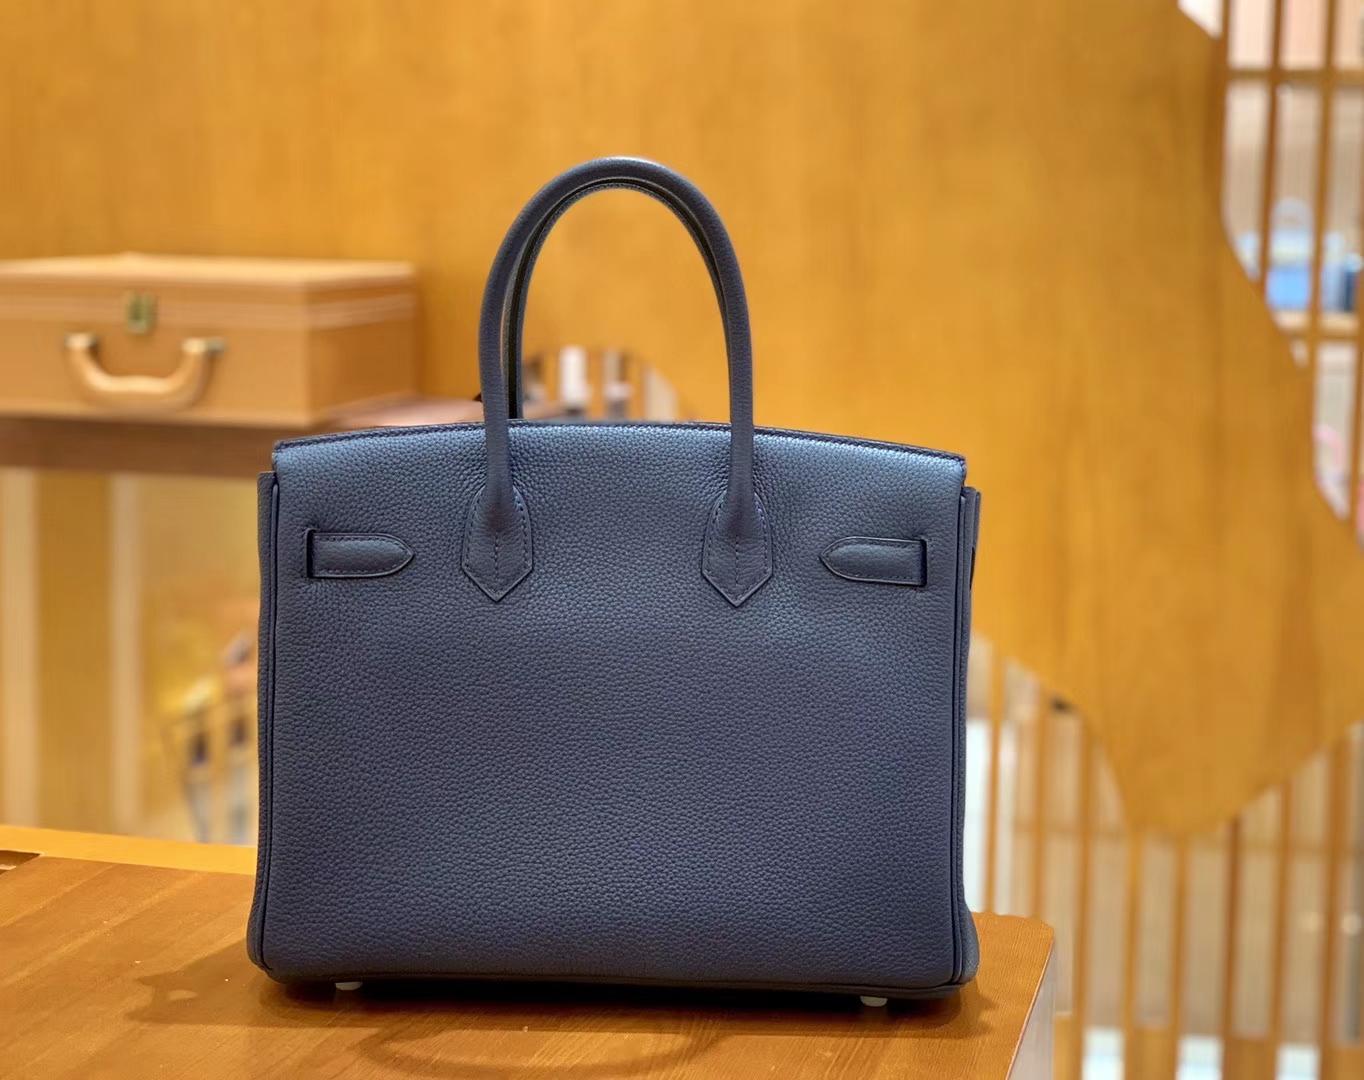 Hermès(爱马仕)Birkin 30cm 中队长 银扣 德国进口togo 牛皮 全手工缝制